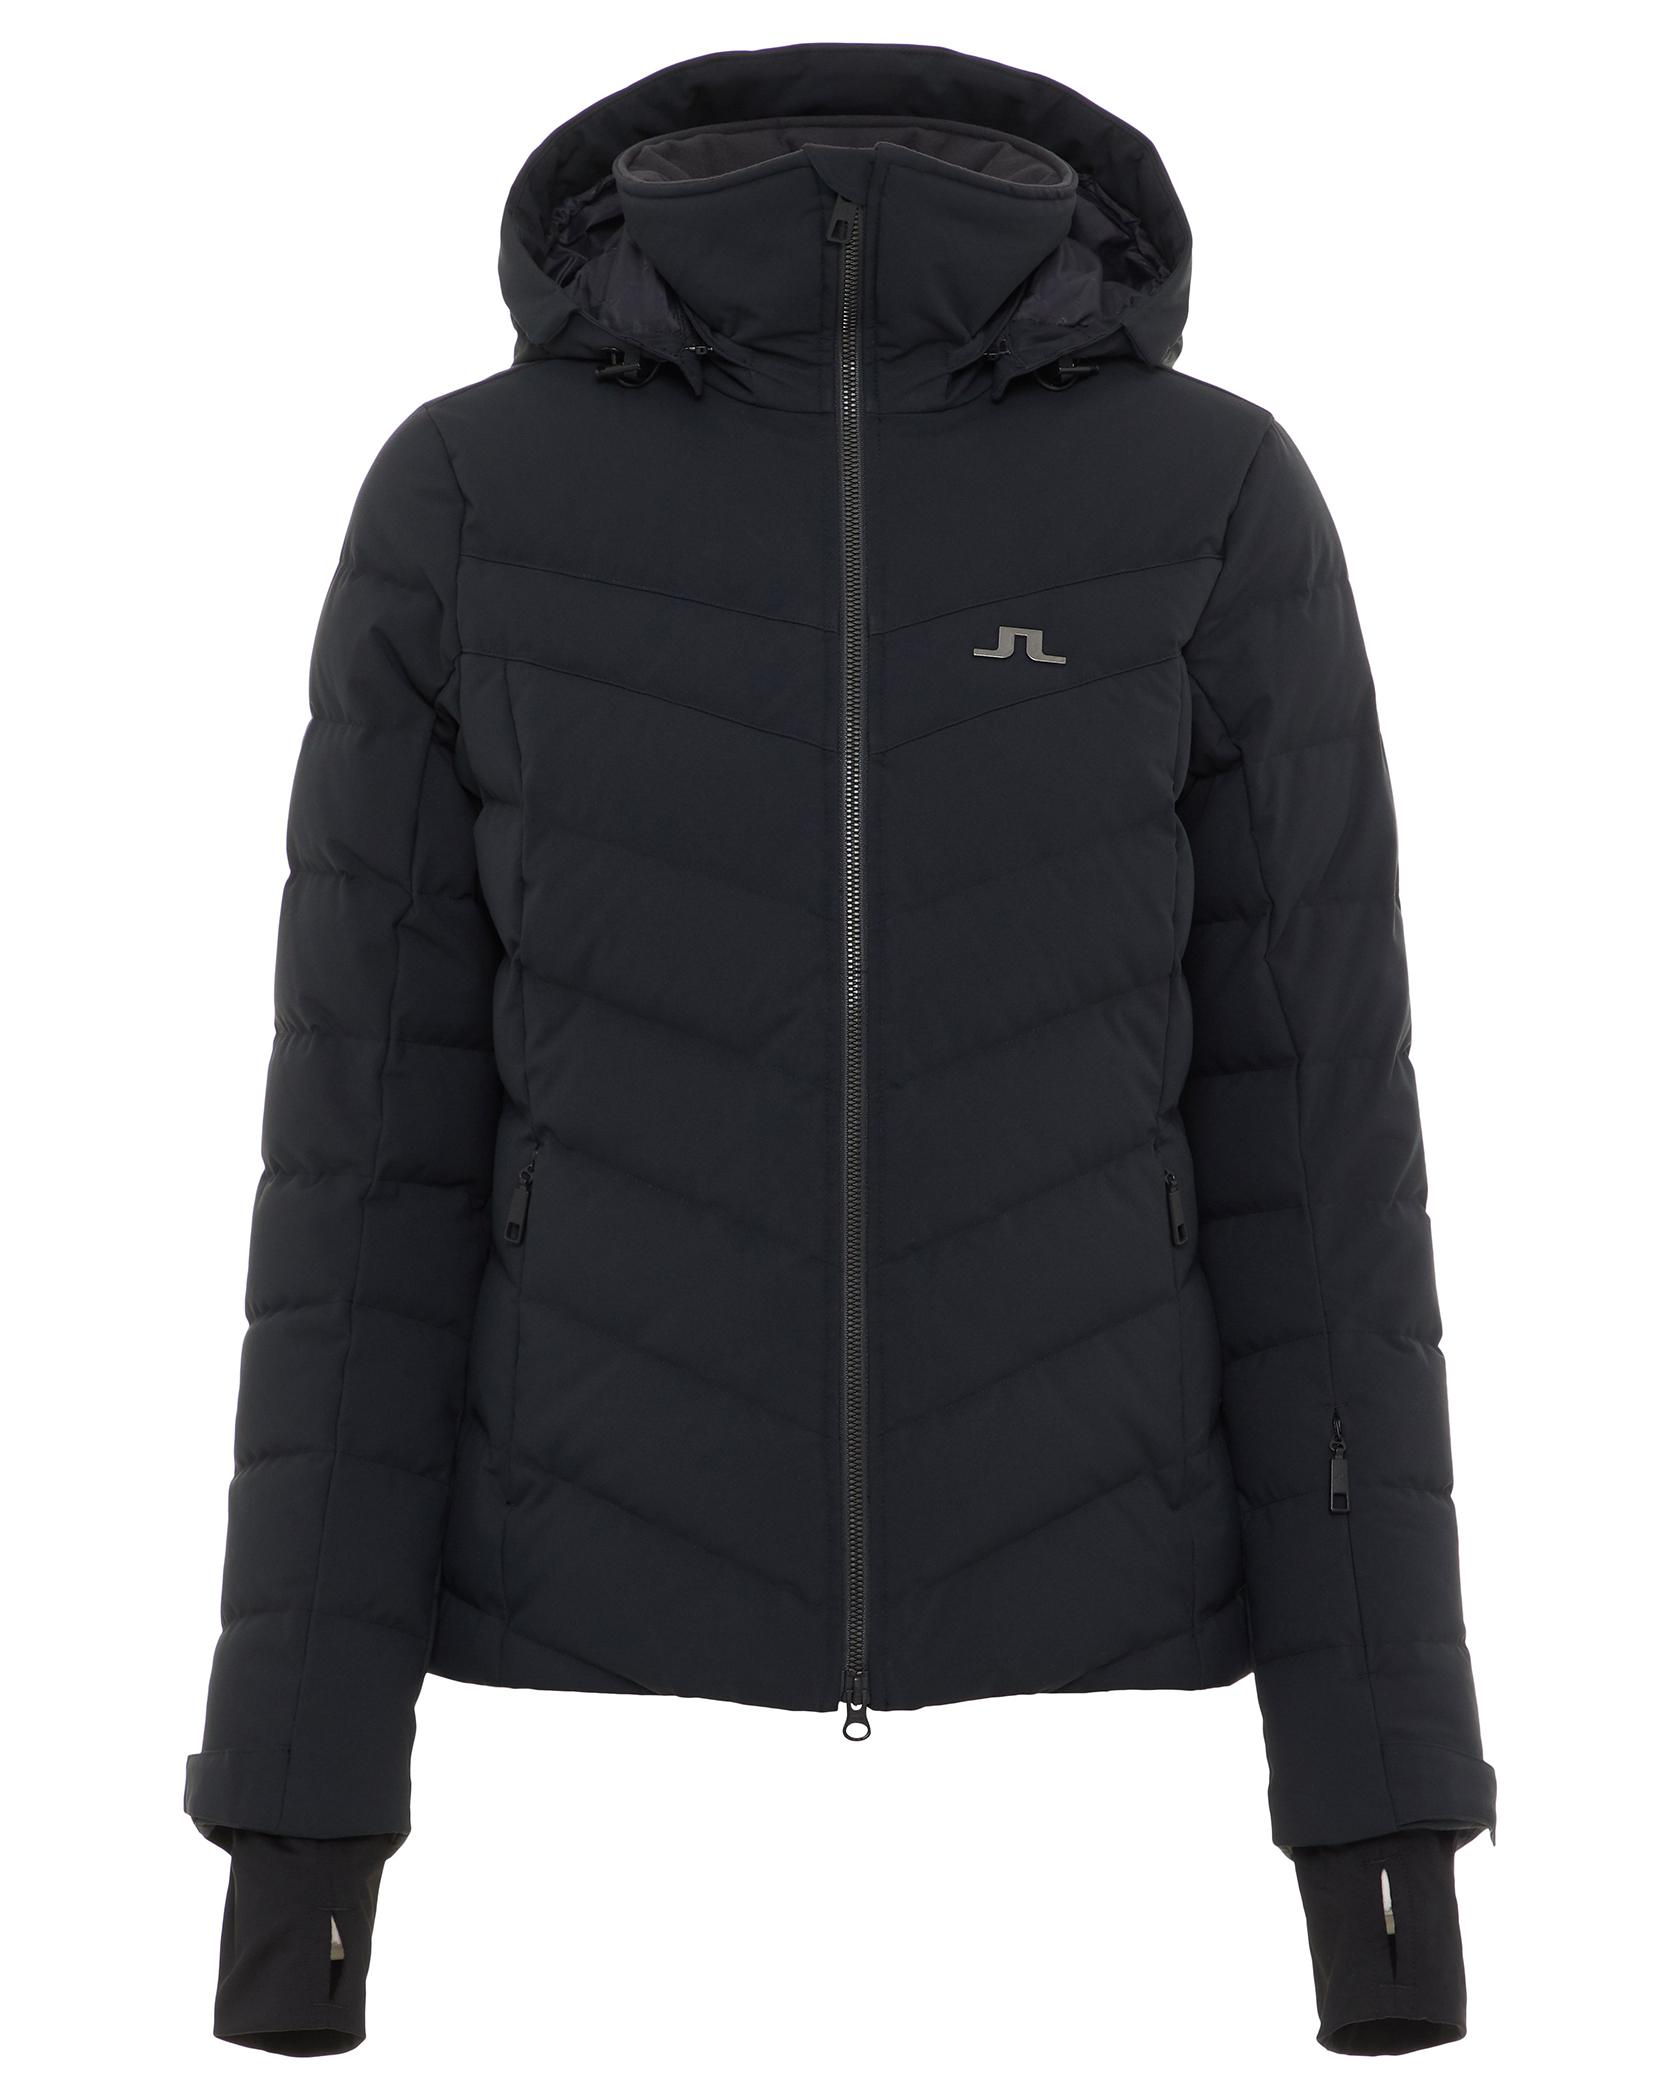 Russel Down 2L Jacket W Black